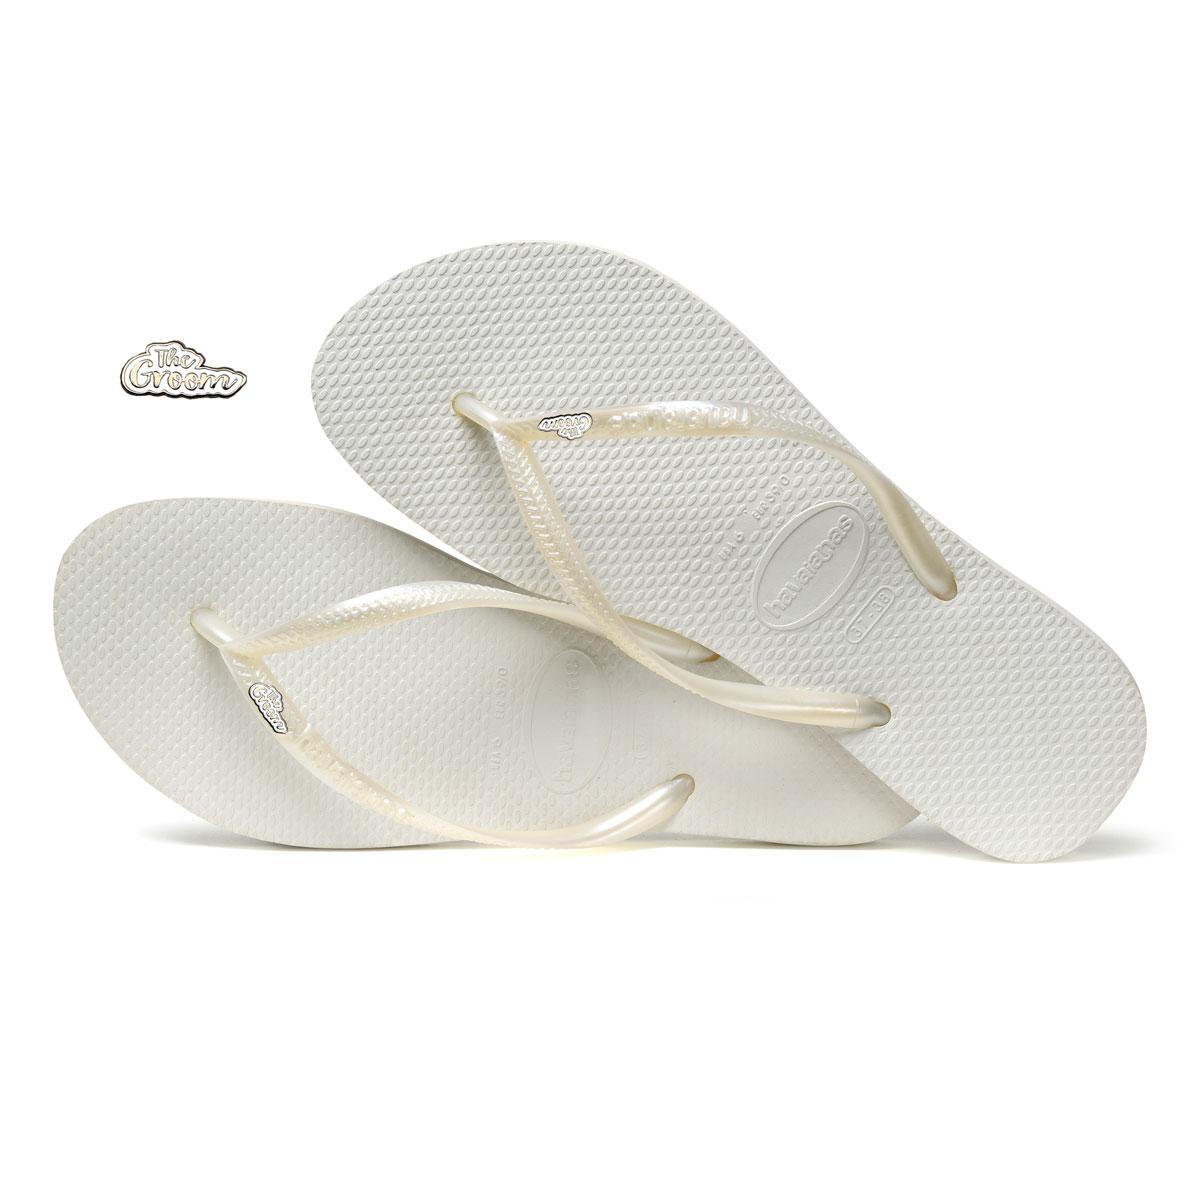 Havaianas White Slim Flip Flops with The Groom Silver Wedding Charm